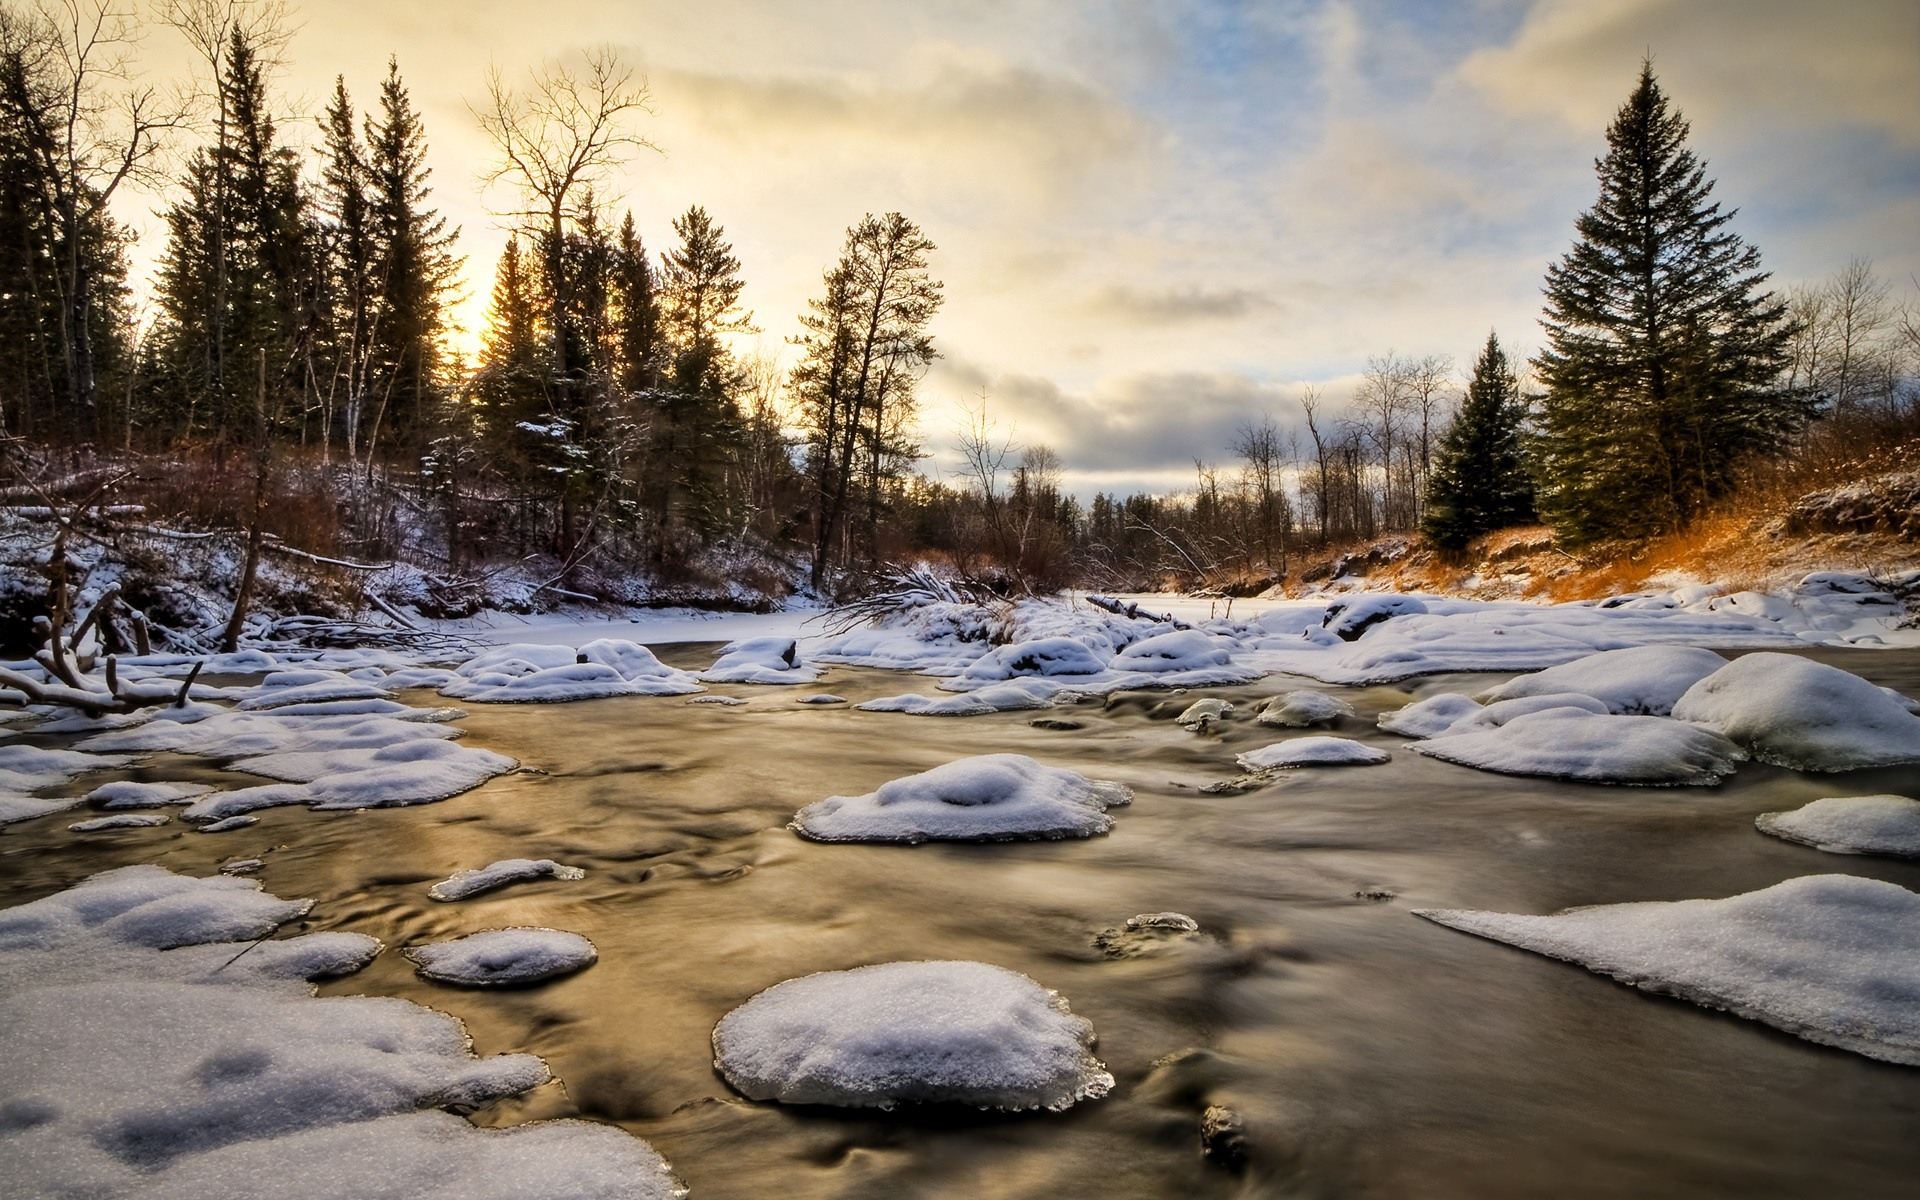 river background scenery original 1920x1200 1920x1200